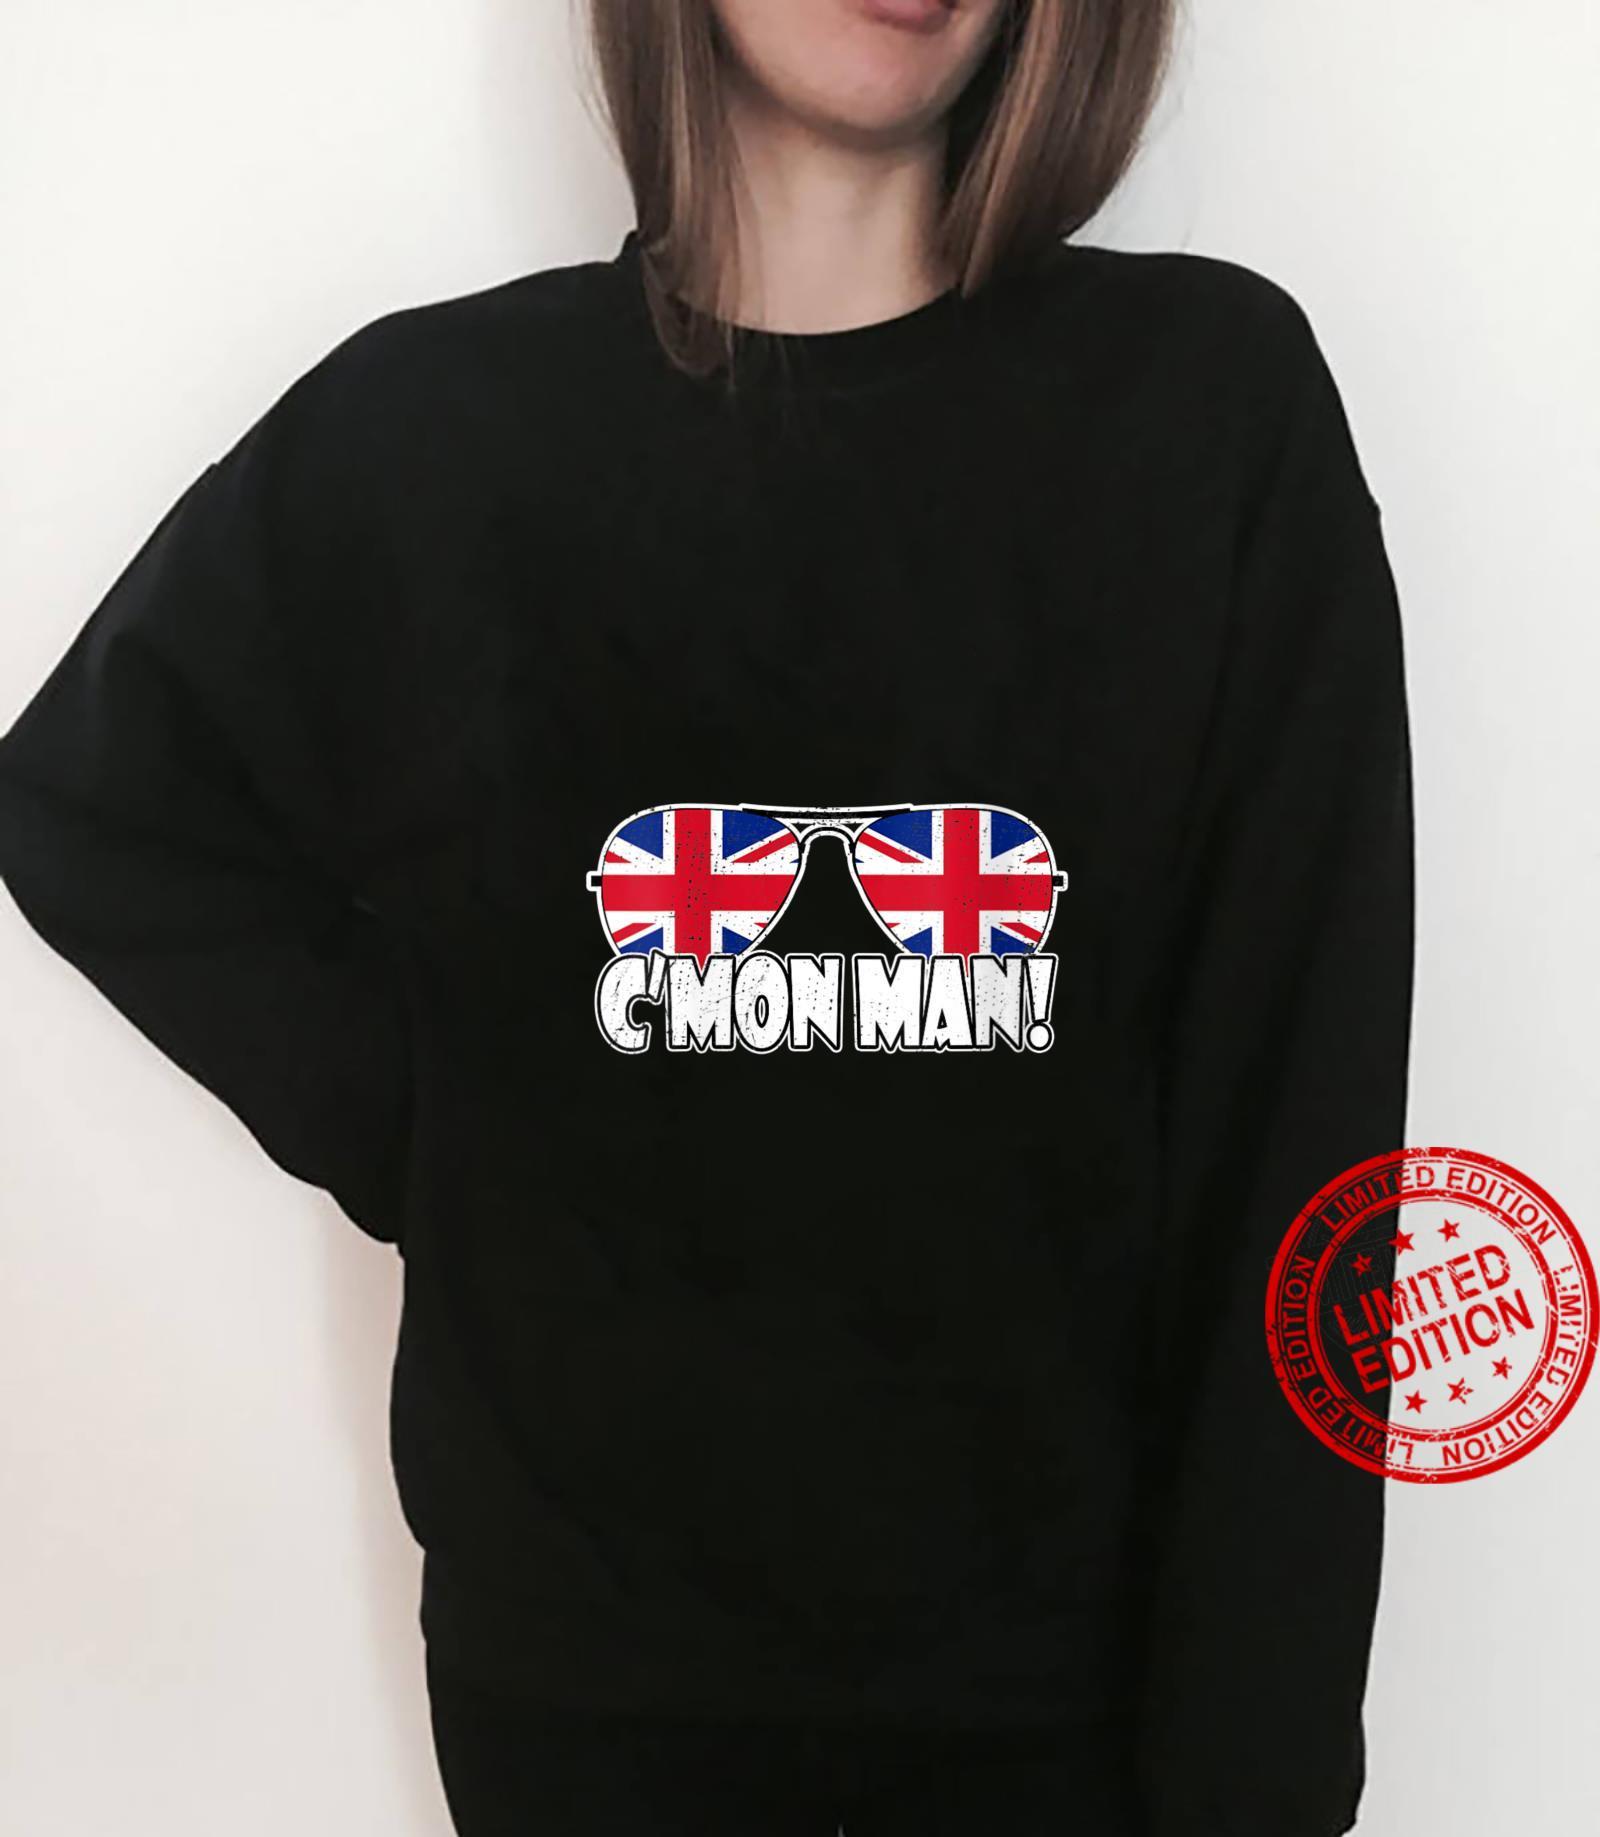 Womens C'MON MAN Come On Man Biden Quote Vintage UK Flag Sunglasses Shirt sweater